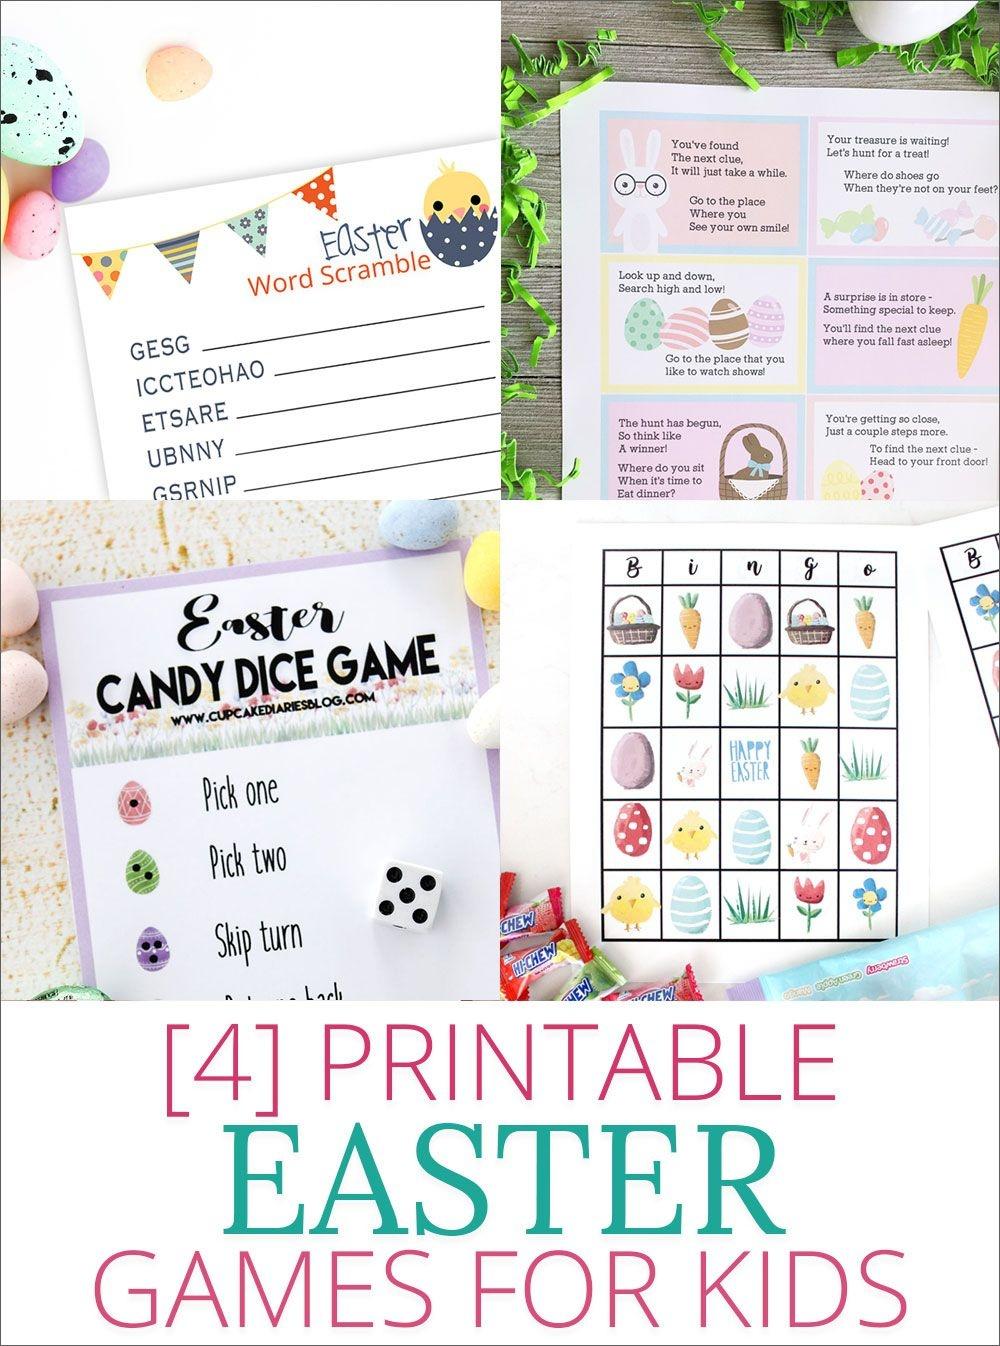 Free Printable Easter Bingo   For The Grandkiddies   Easter Games - Easter Games For Adults Printable Free